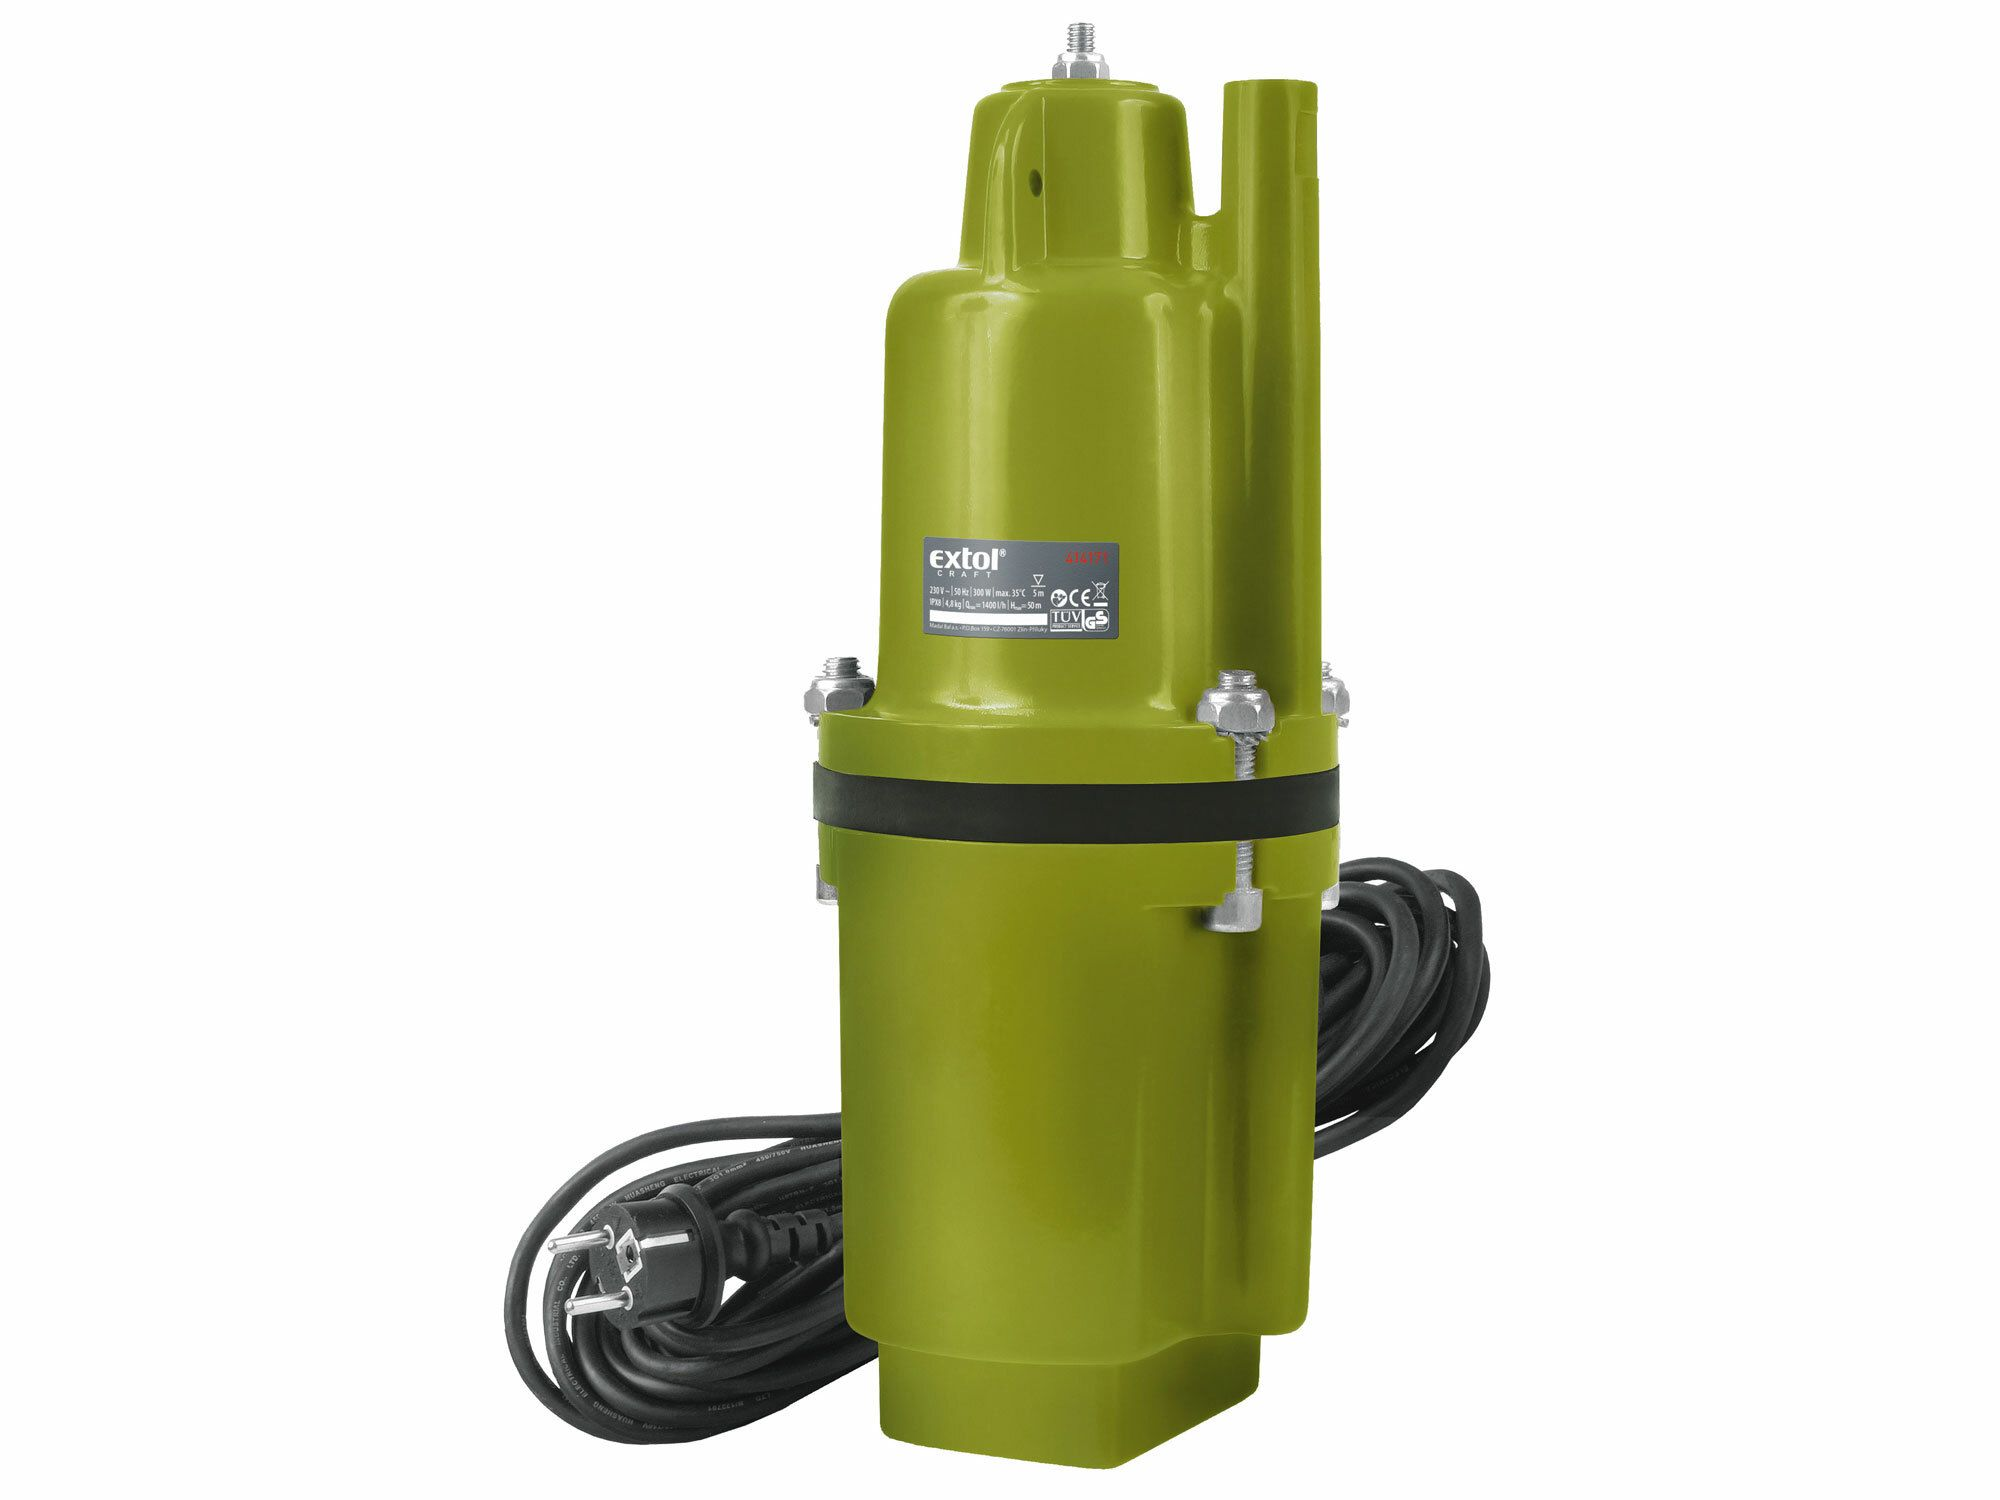 Čerpadlo membránové hlbinné ponorné, 300W, 1400l/hod, 20m, EXTOL CRAFT, 414171